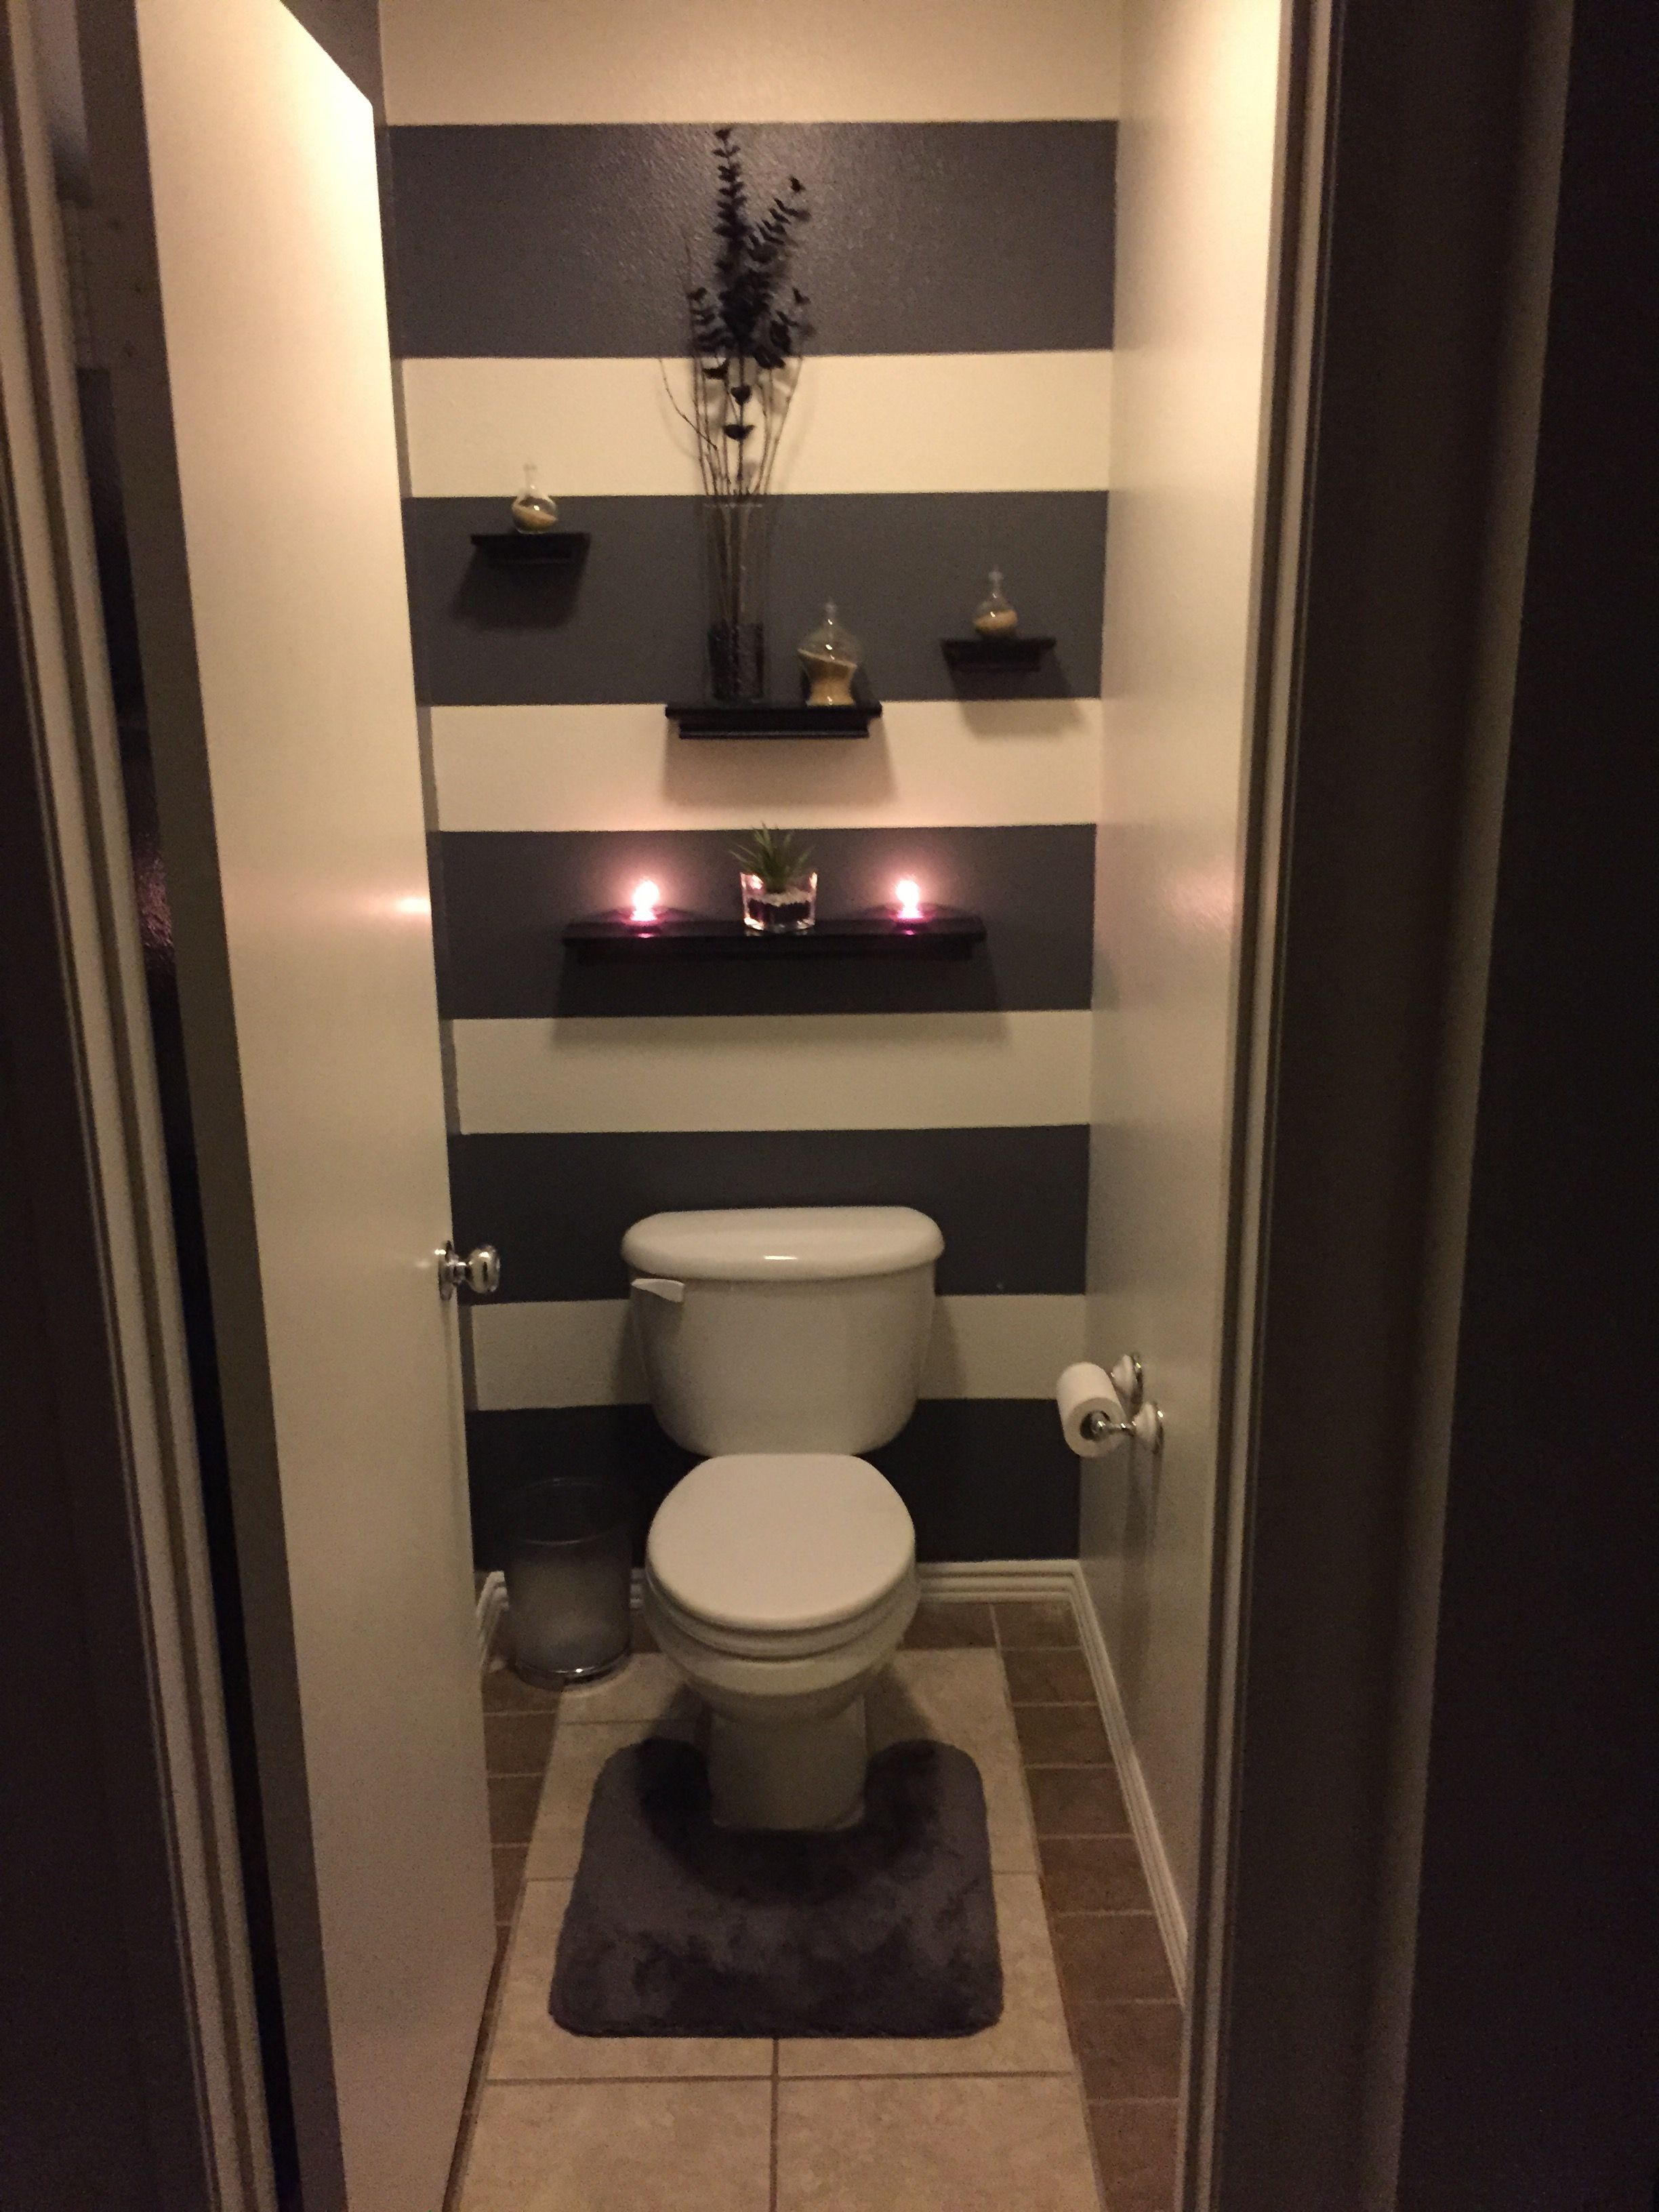 Do a light & dark shade of the same color | Bathroom layout ...